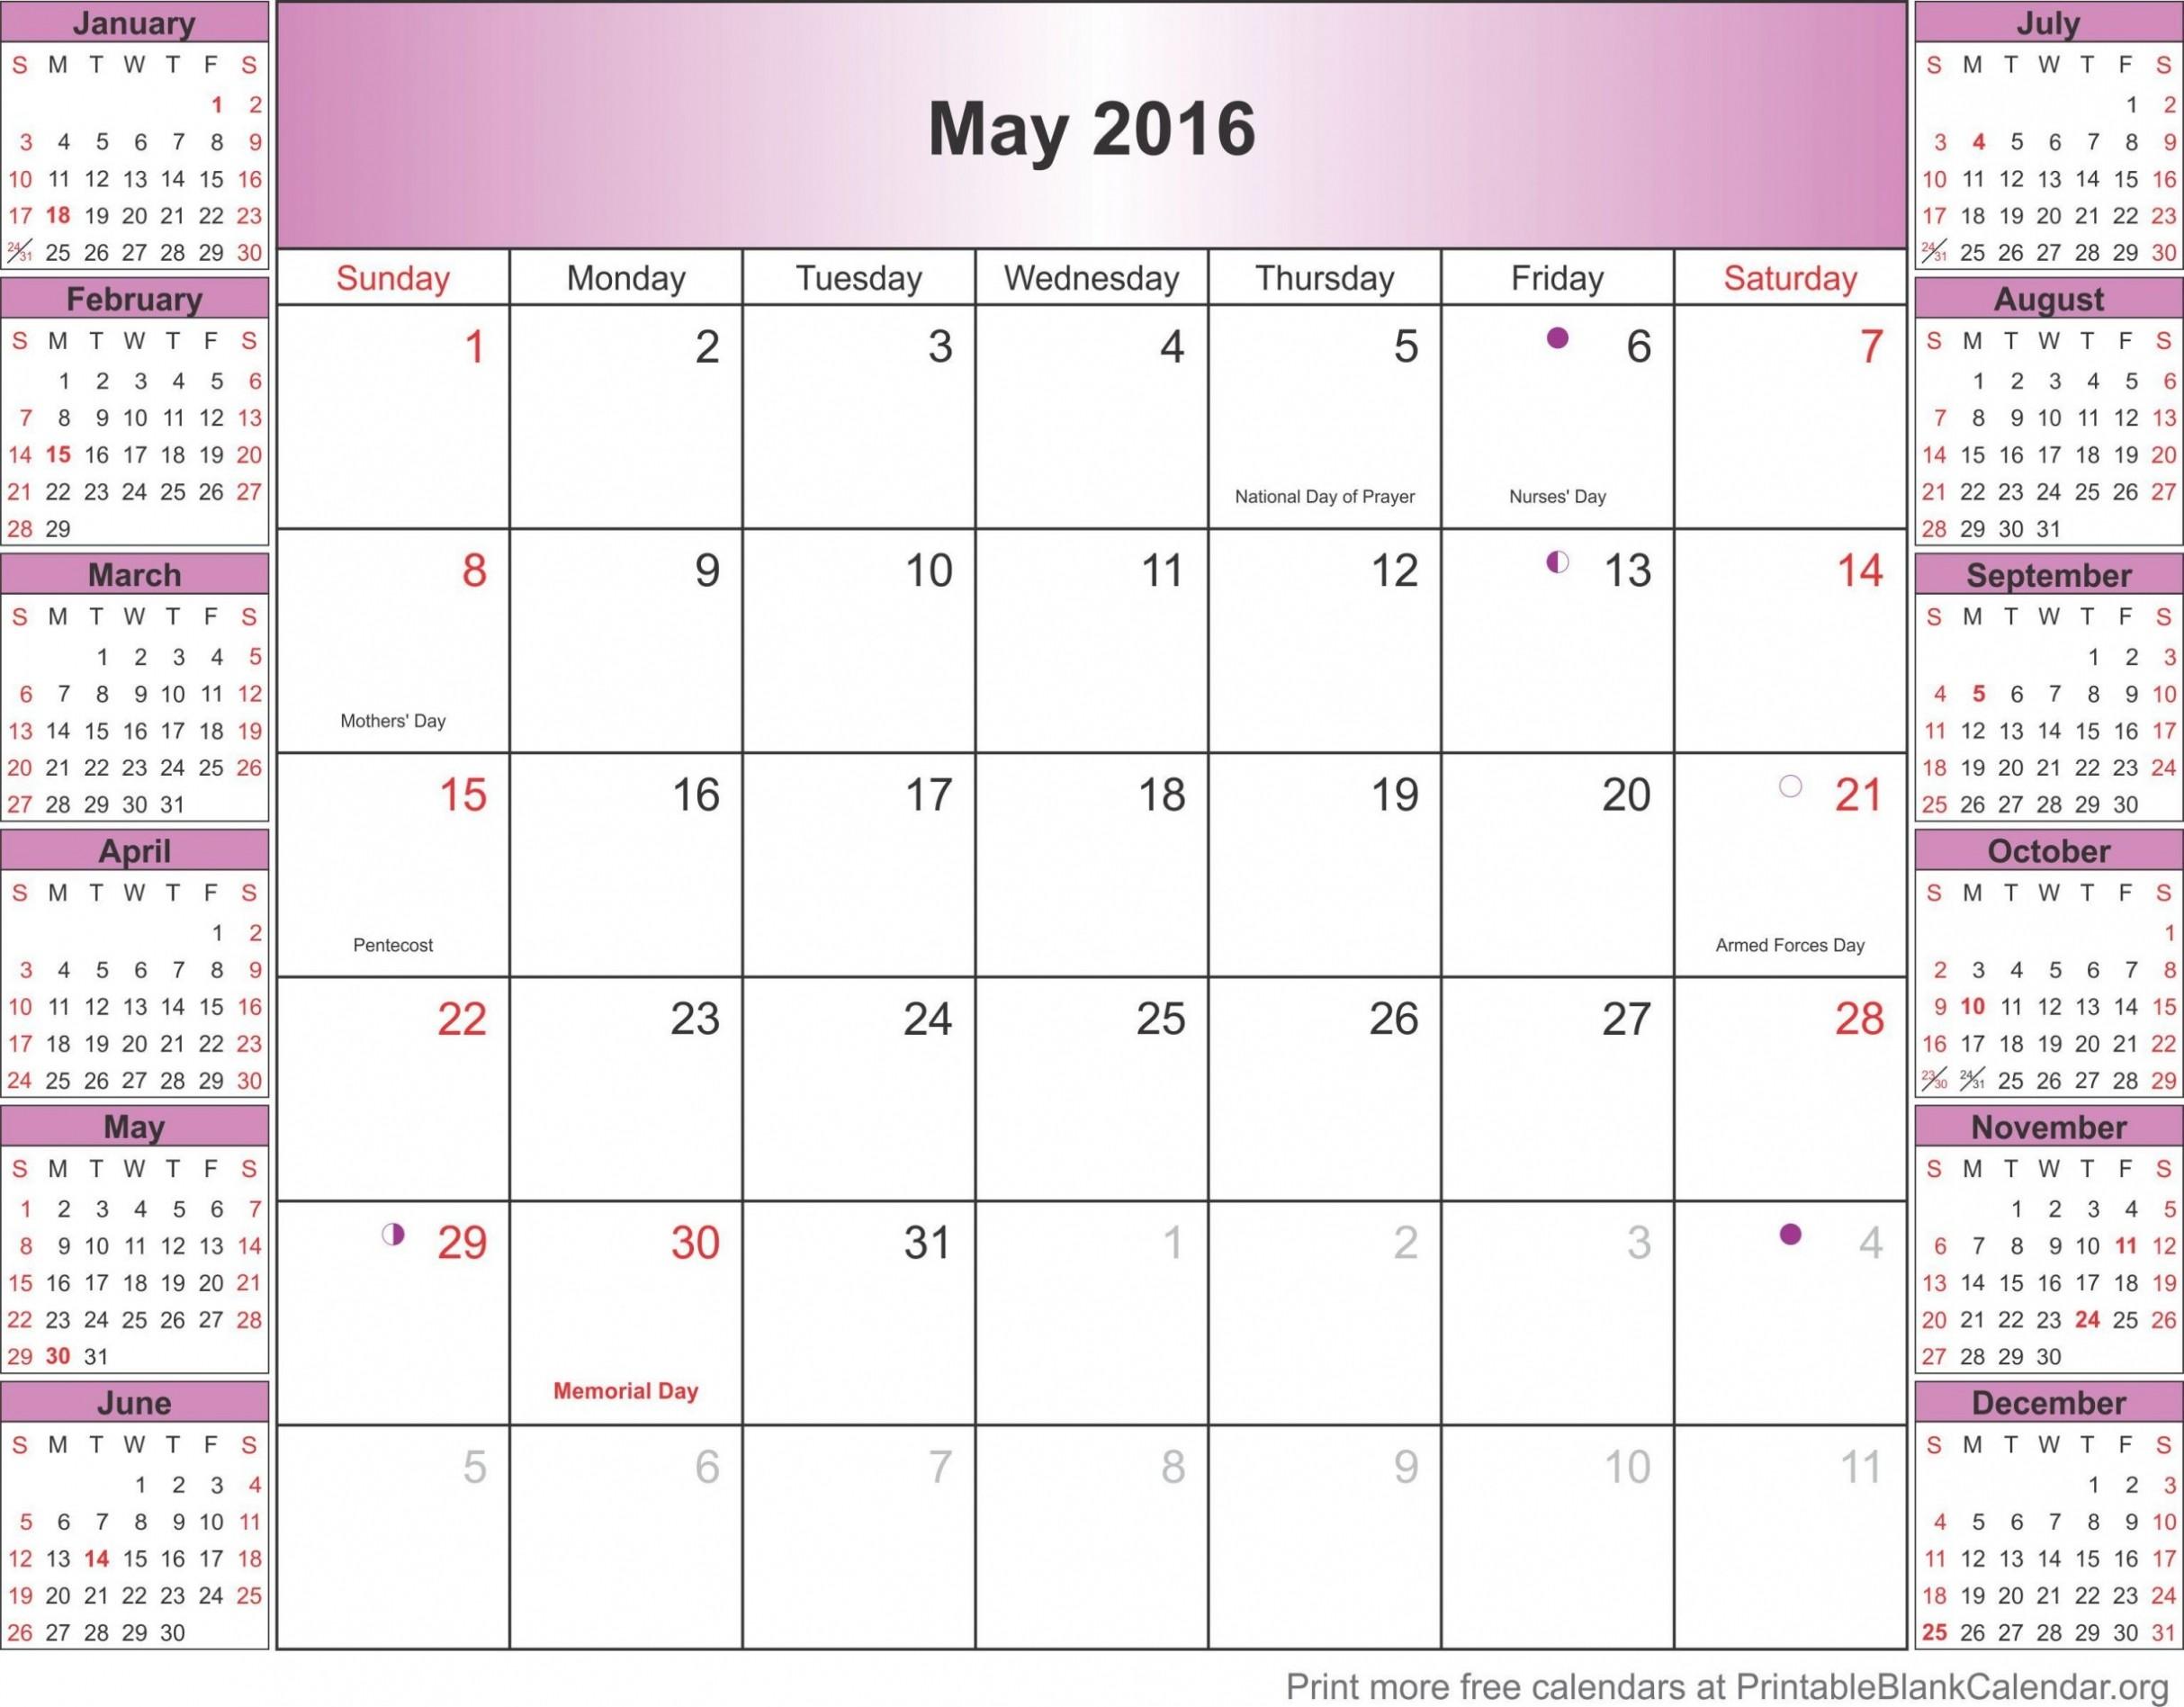 Beautiful May 2016 Printable Calendar Template Printableblankcalendar Calendario Colombia Con Festivos 2017 hd4